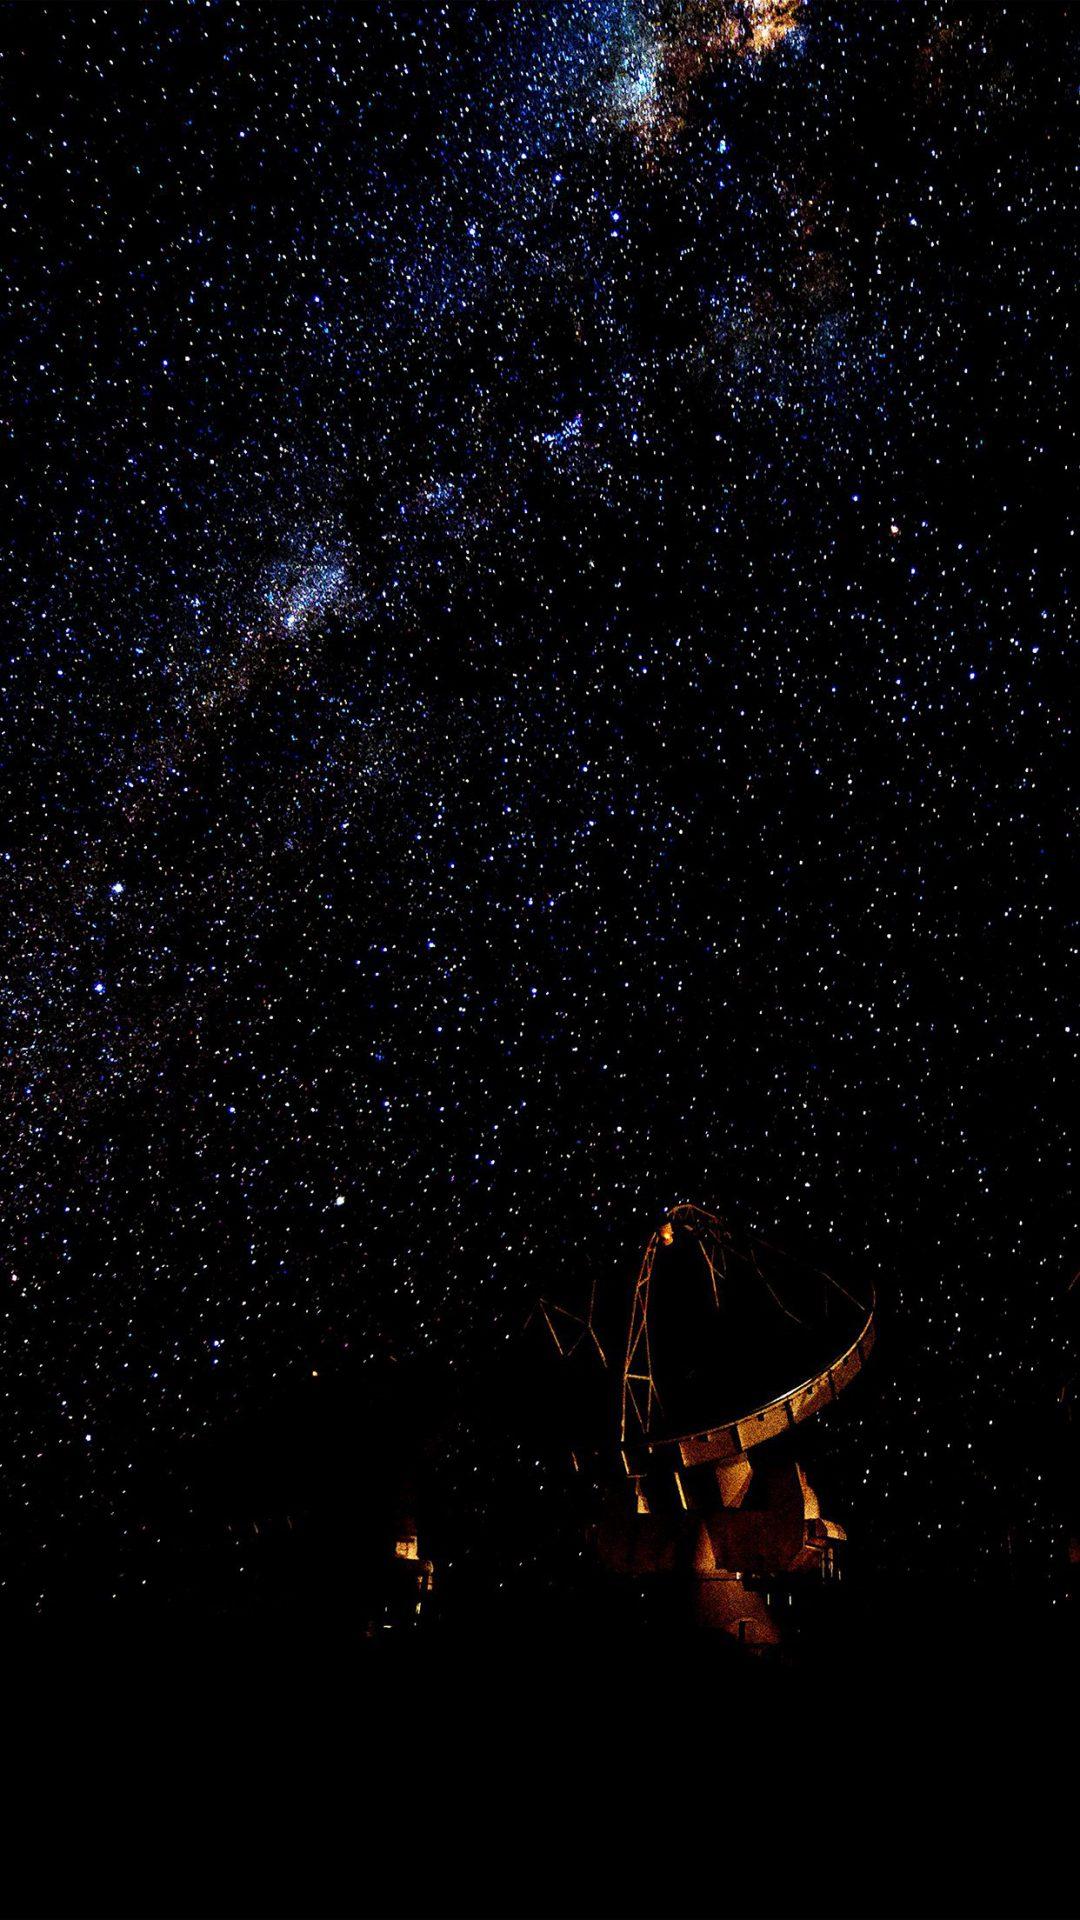 Space Dark Star Nature Black Sky